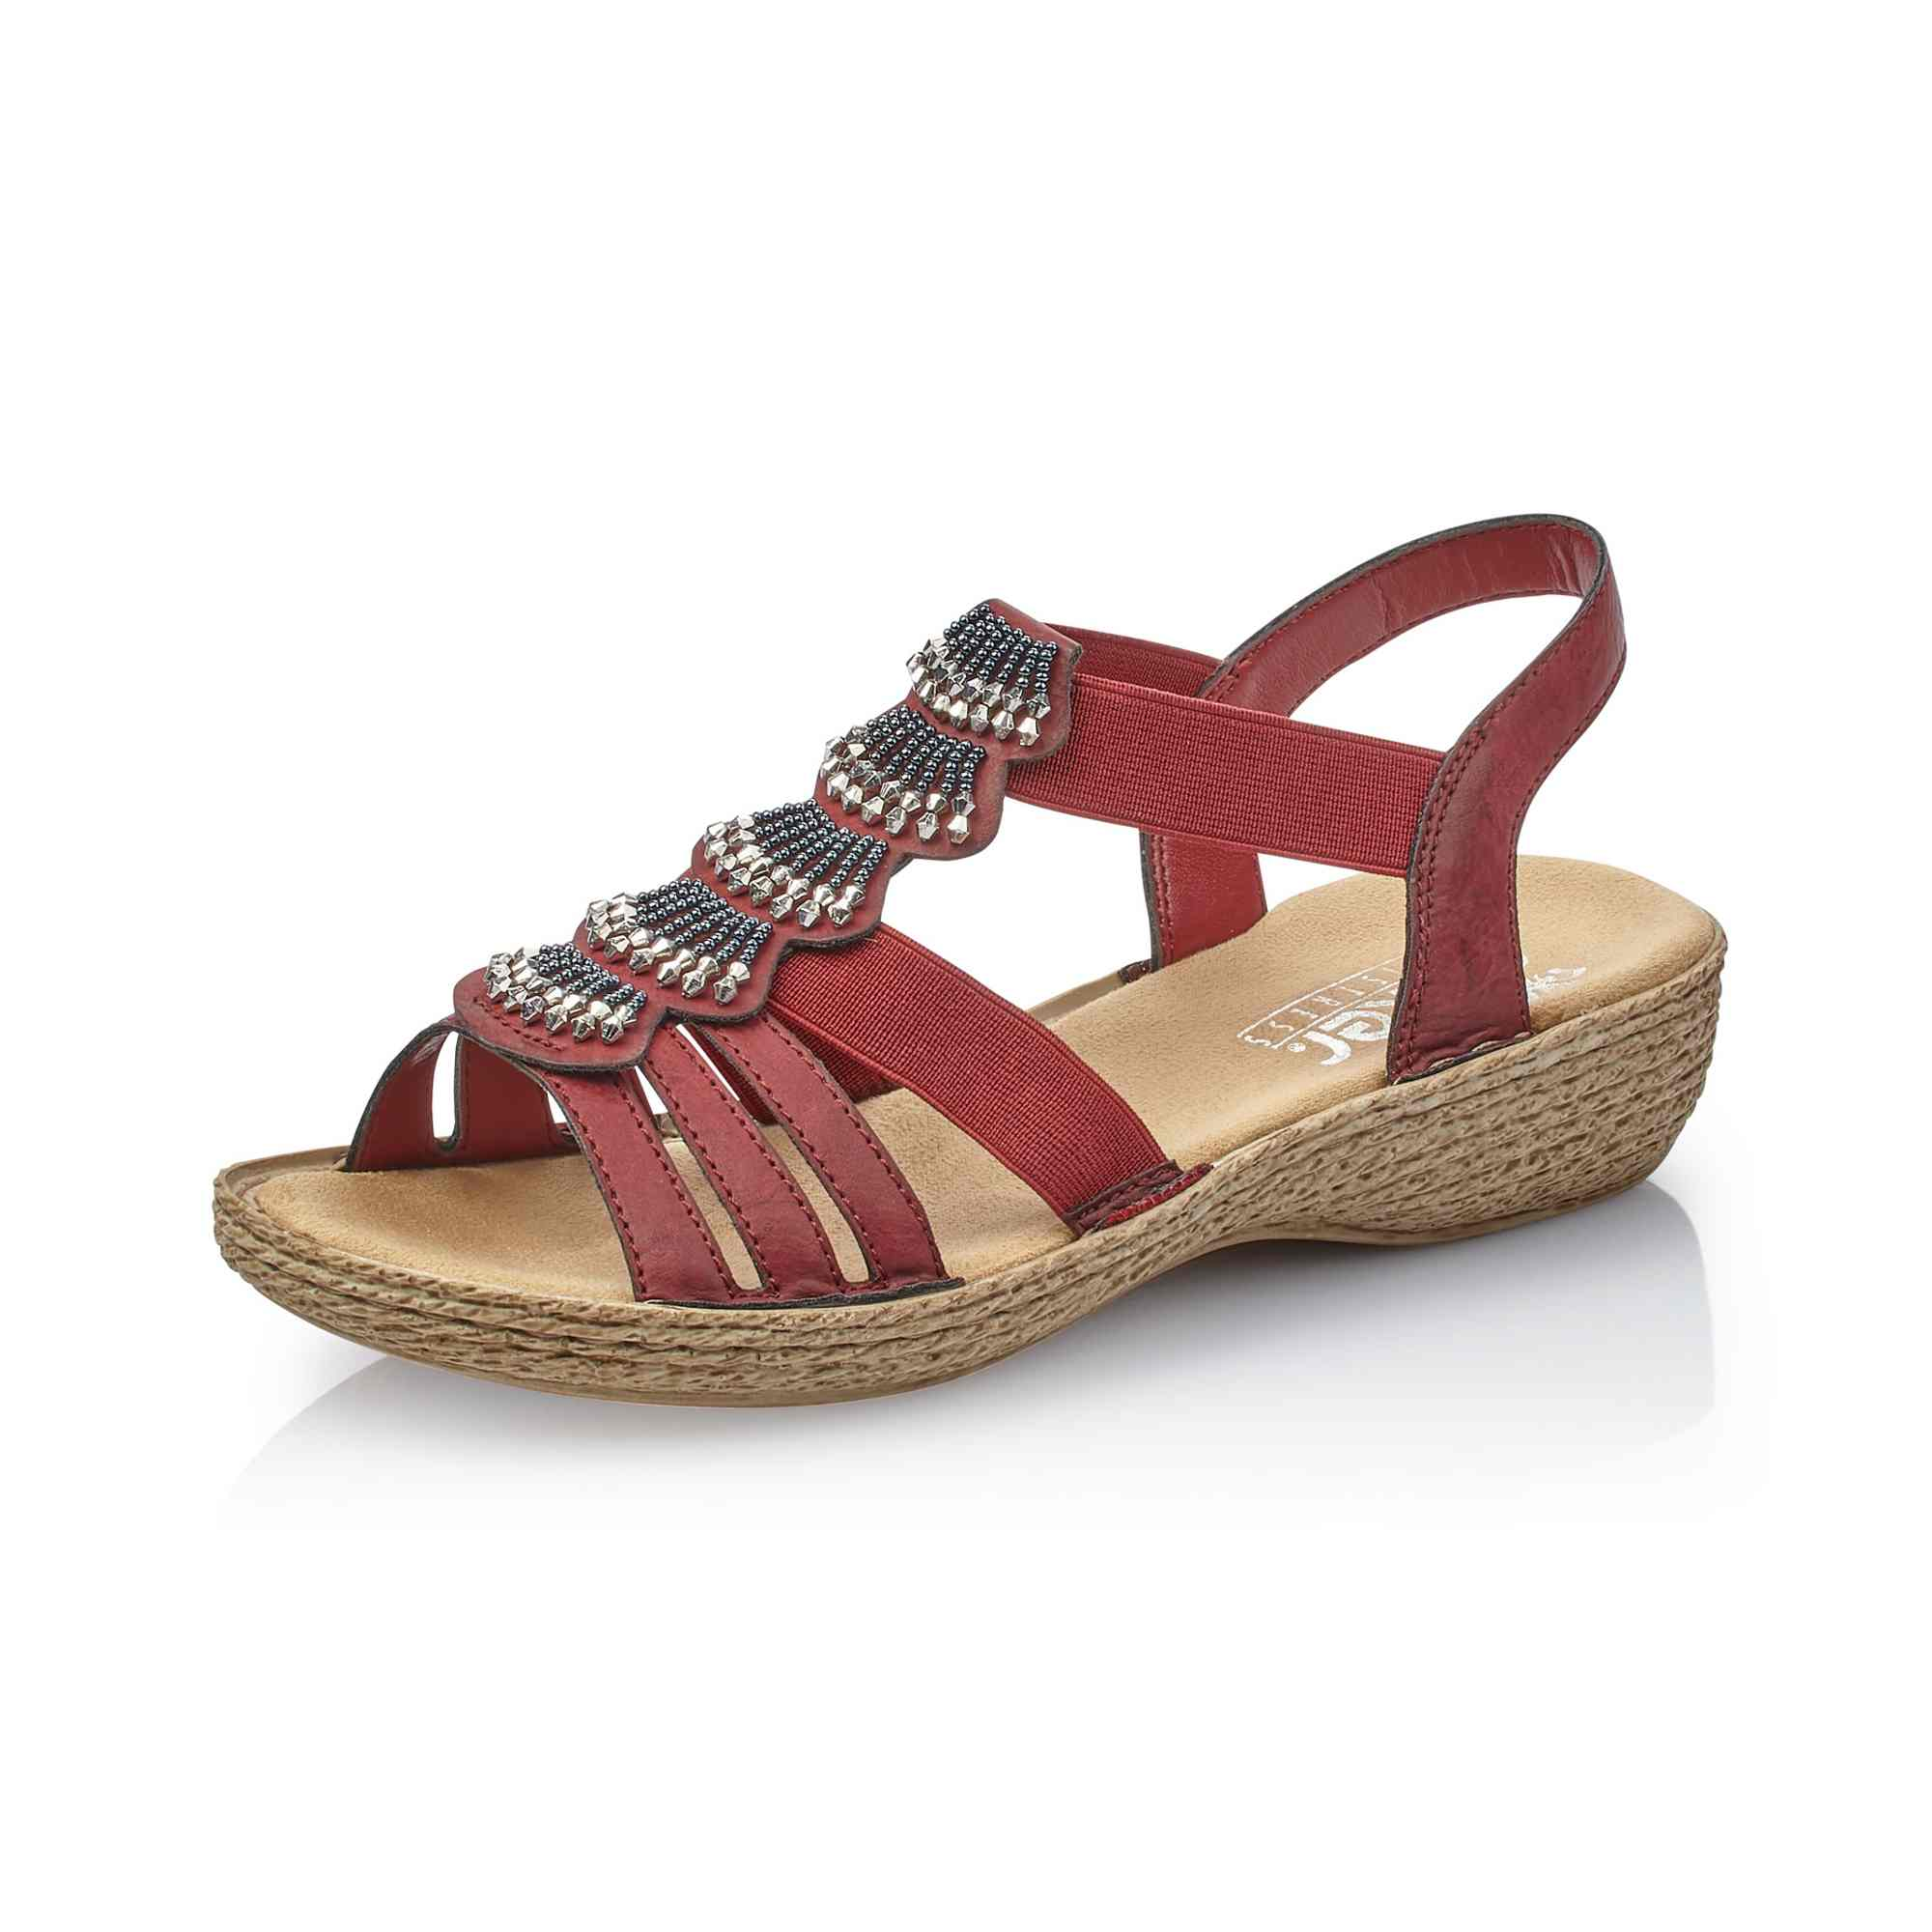 Dámská obuv RIEKER65869-35 ROT F S 9  06b1664f96